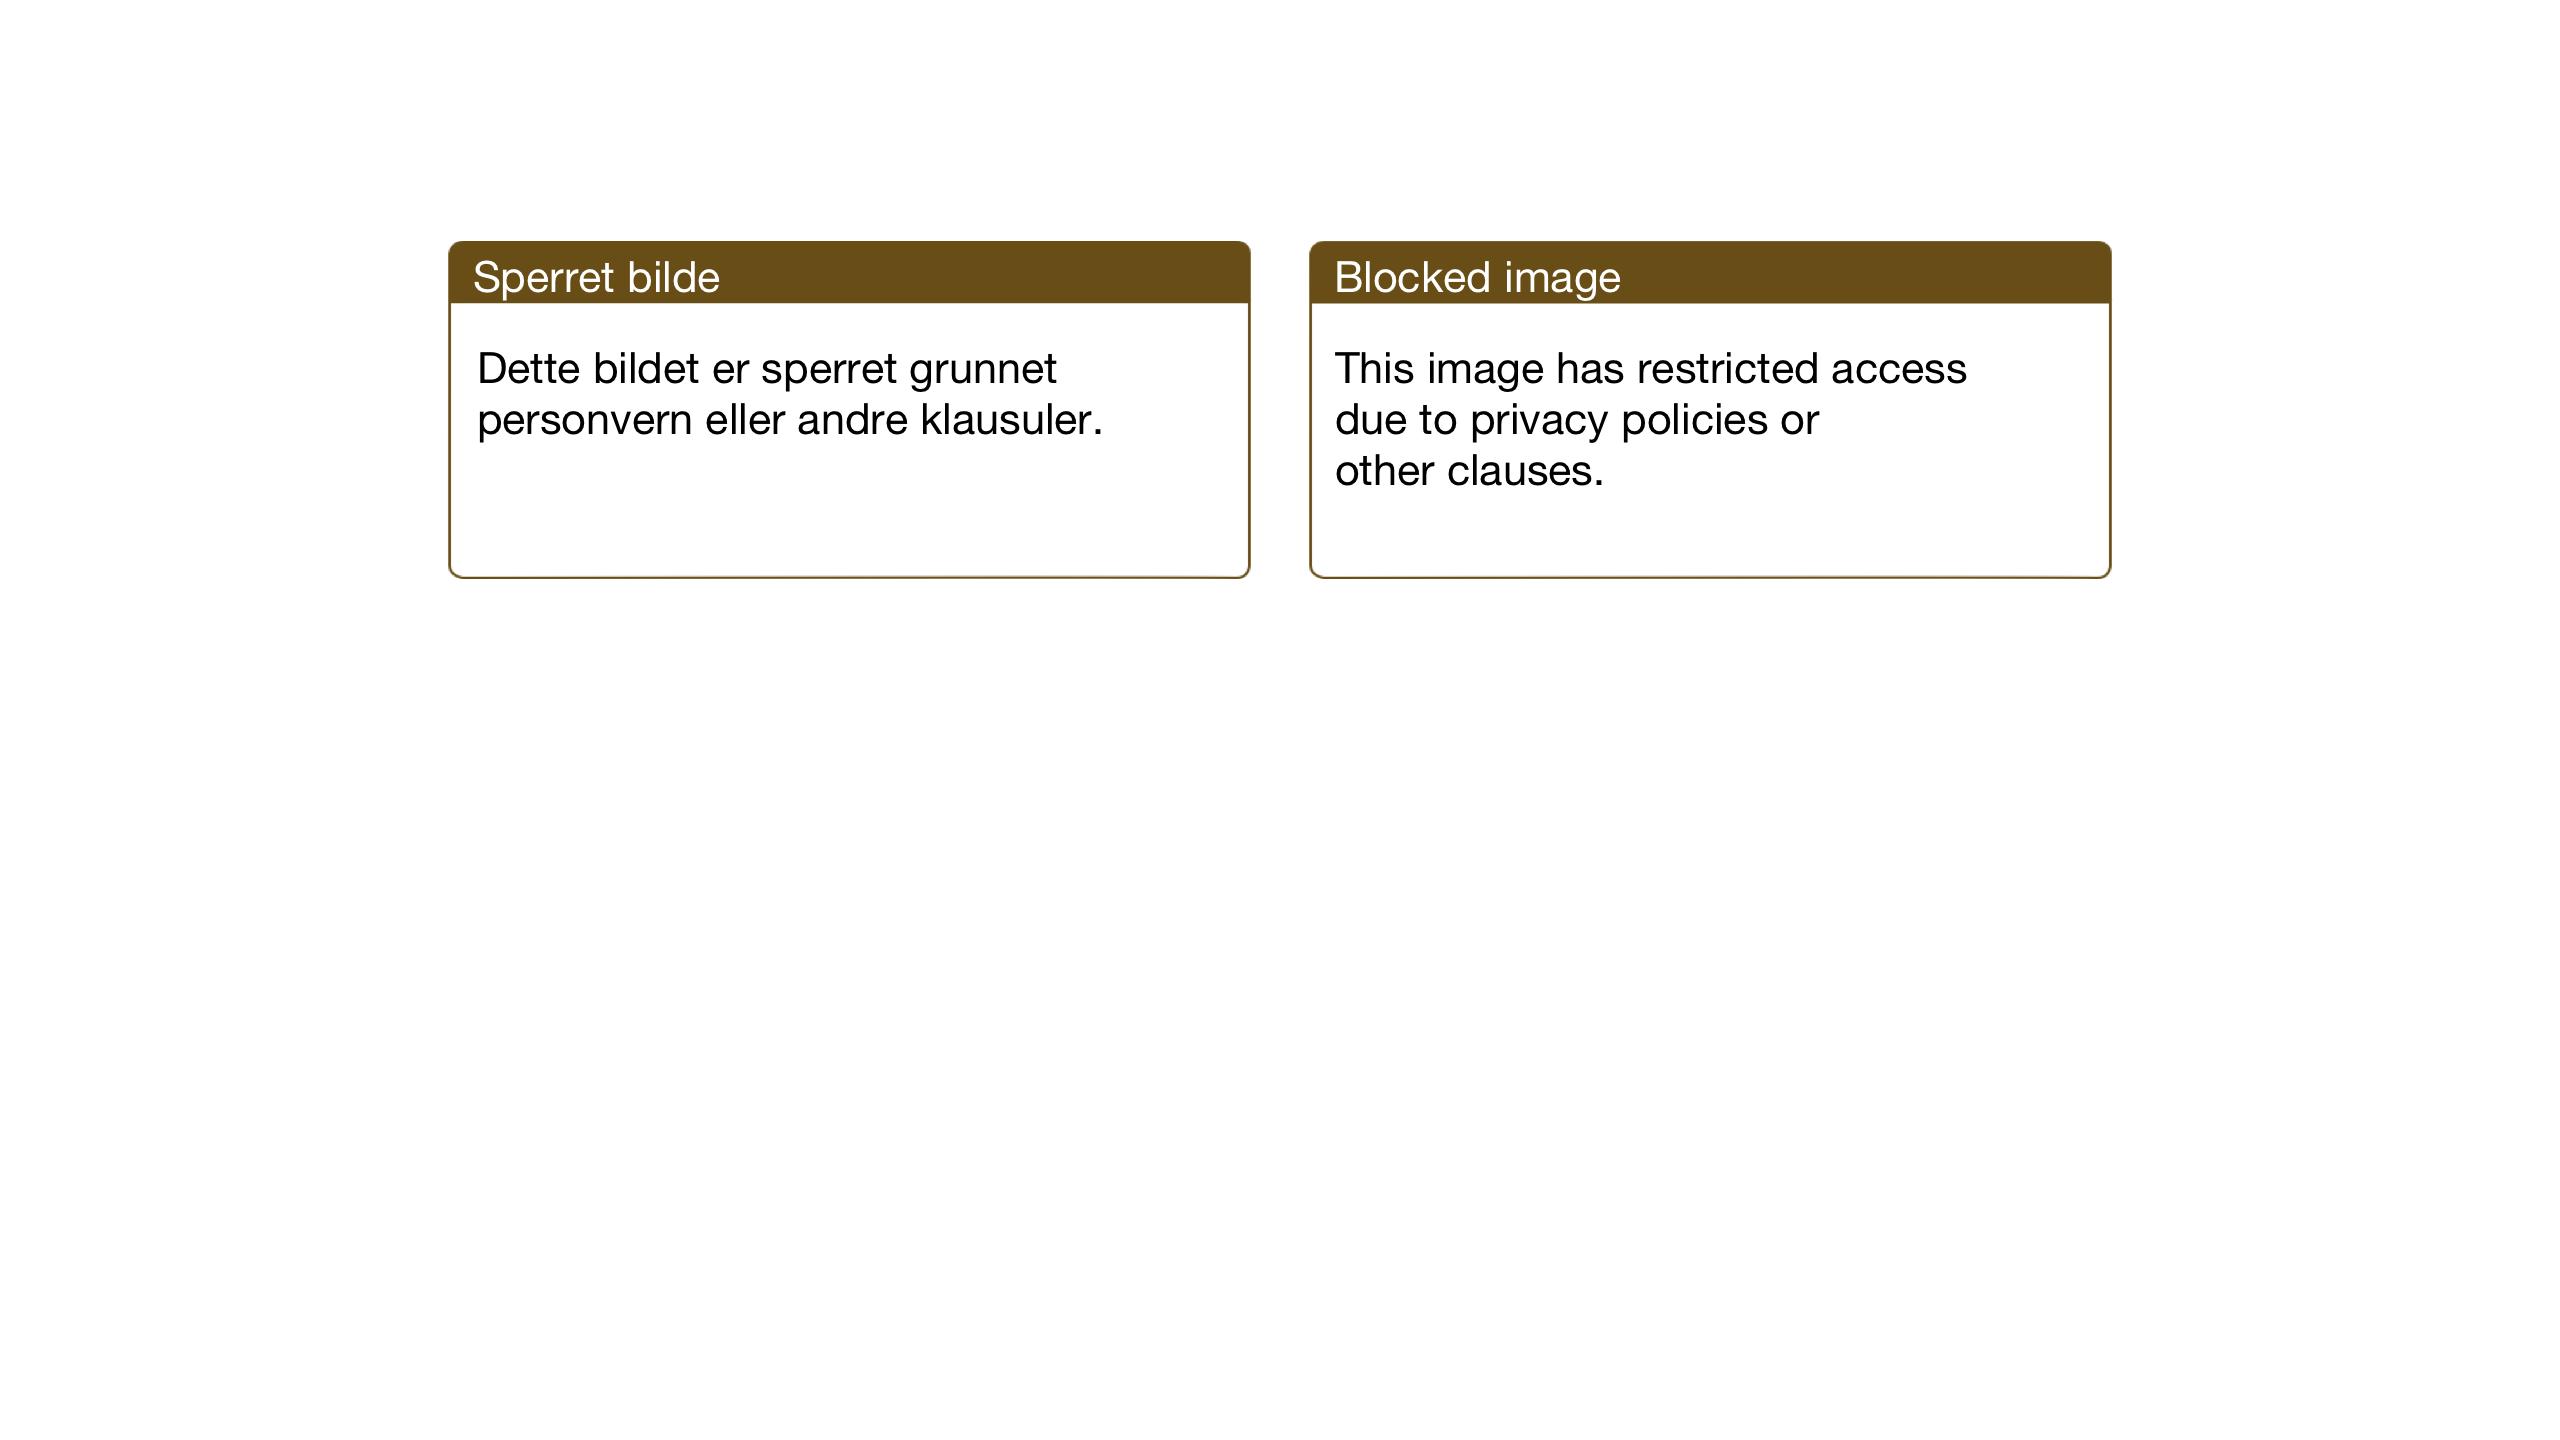 RA, Justisdepartementet, Politiavdelingen (RA/SDJ-6873), 1997, s. 1